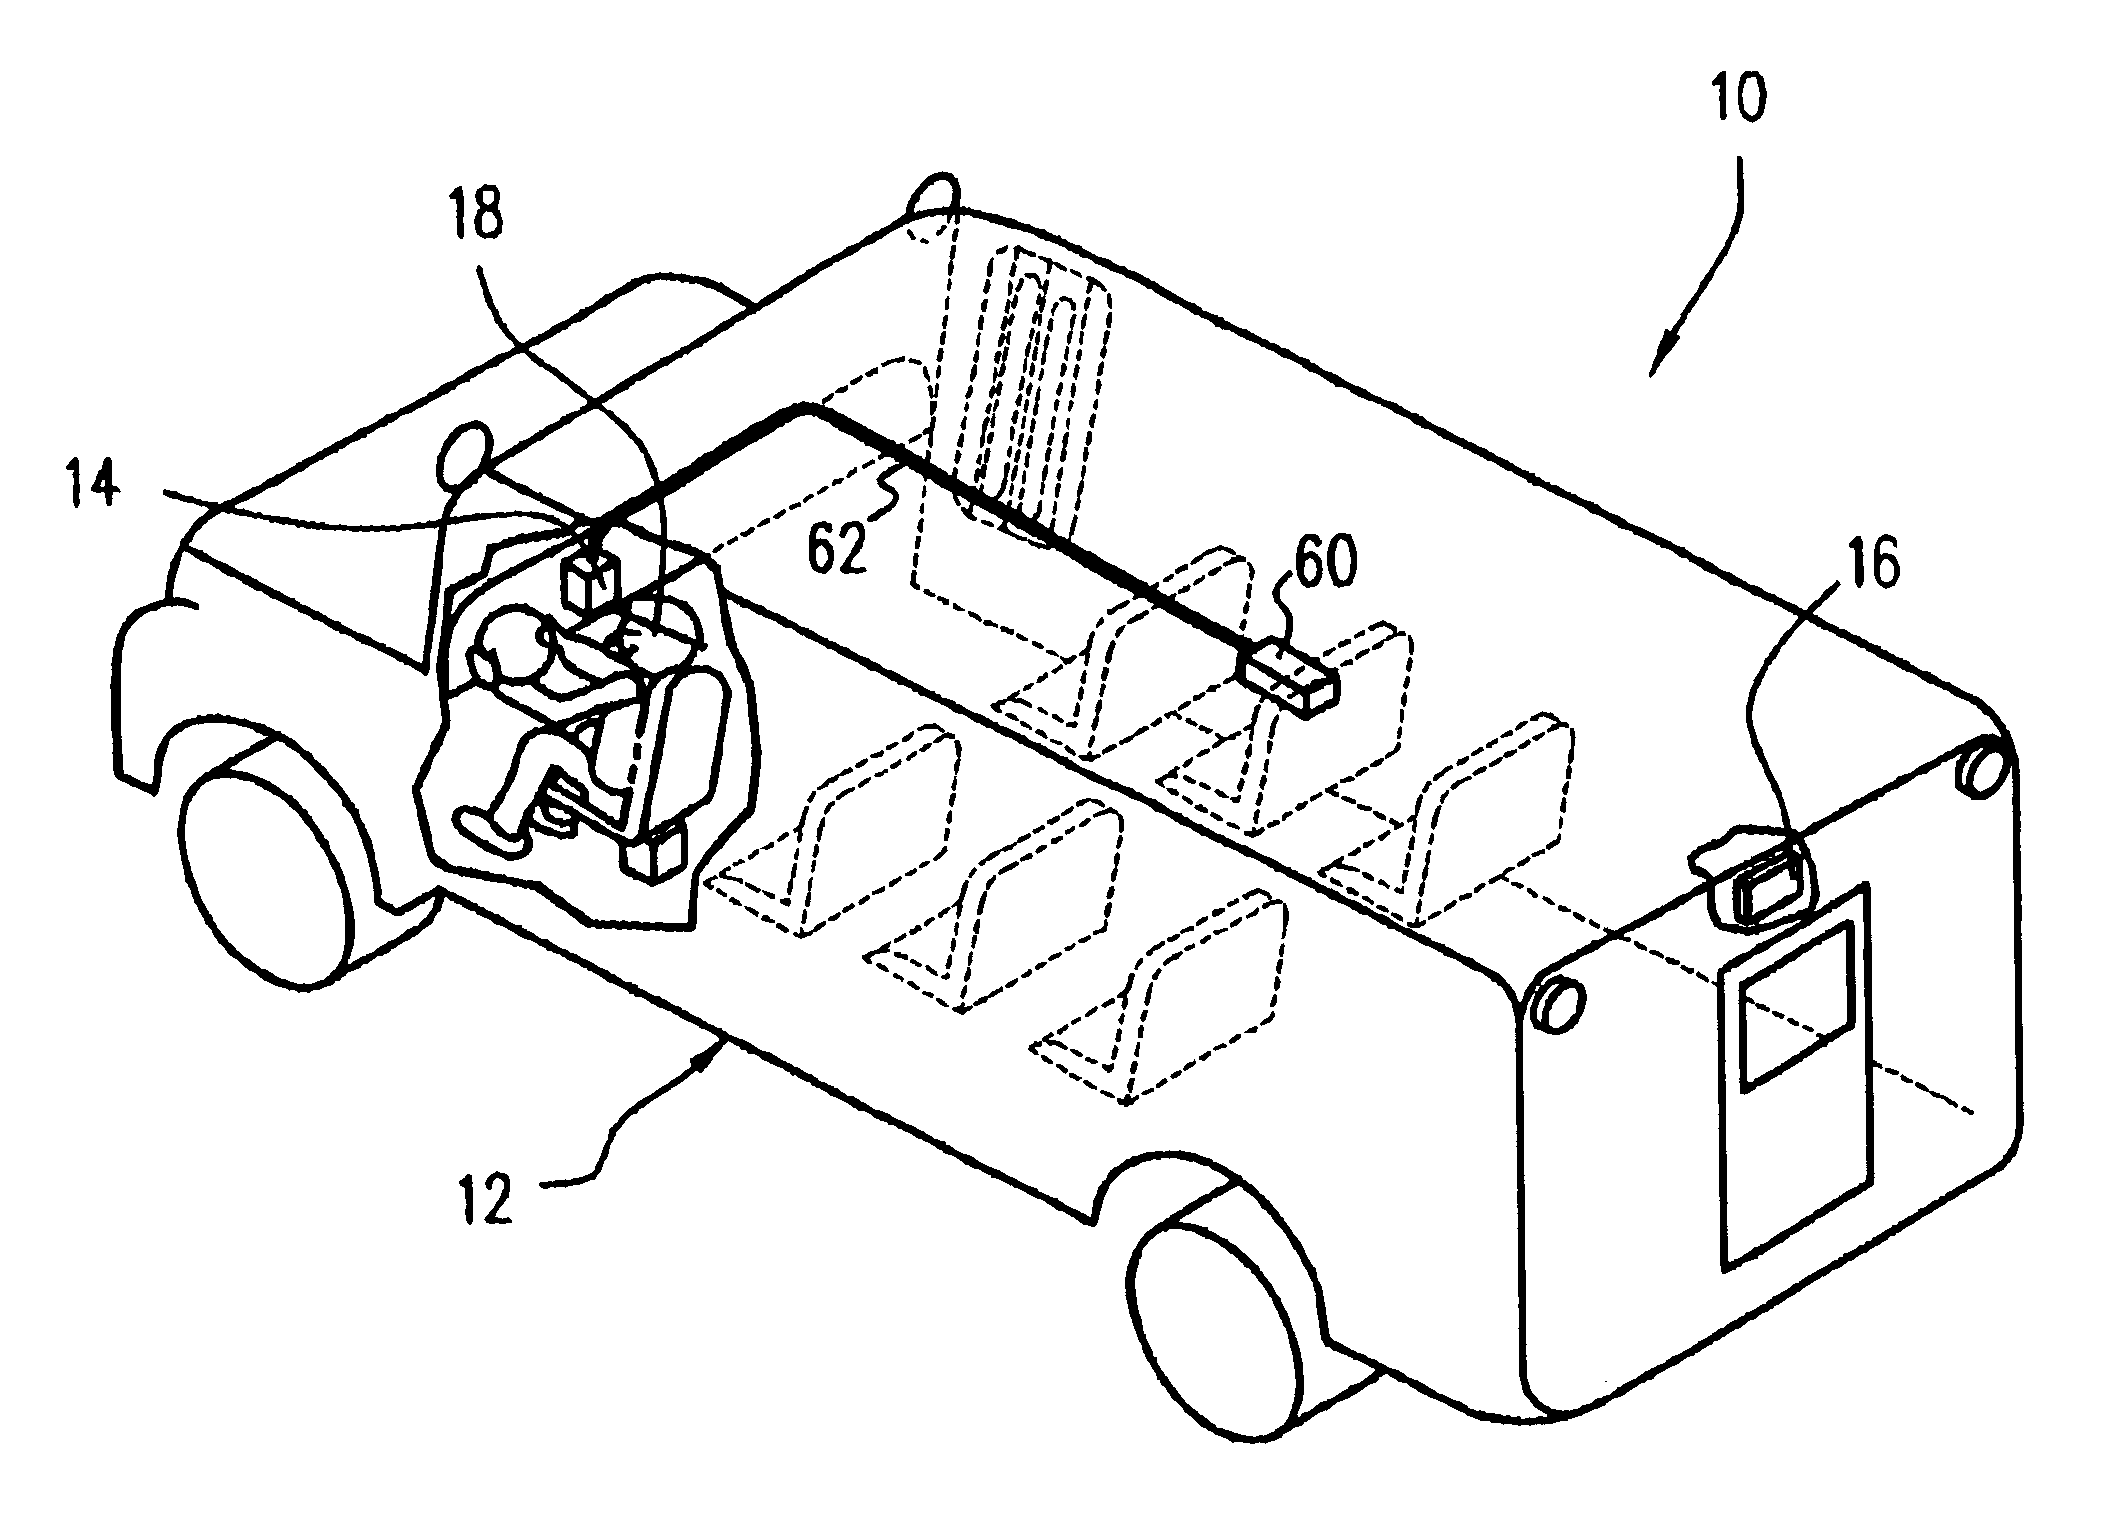 A O Smith Model C48m2dc11a1 Motor Wiring Diagram. . Wiring ... A O Smith Model C M Dc A Motor Wiring Diagram on